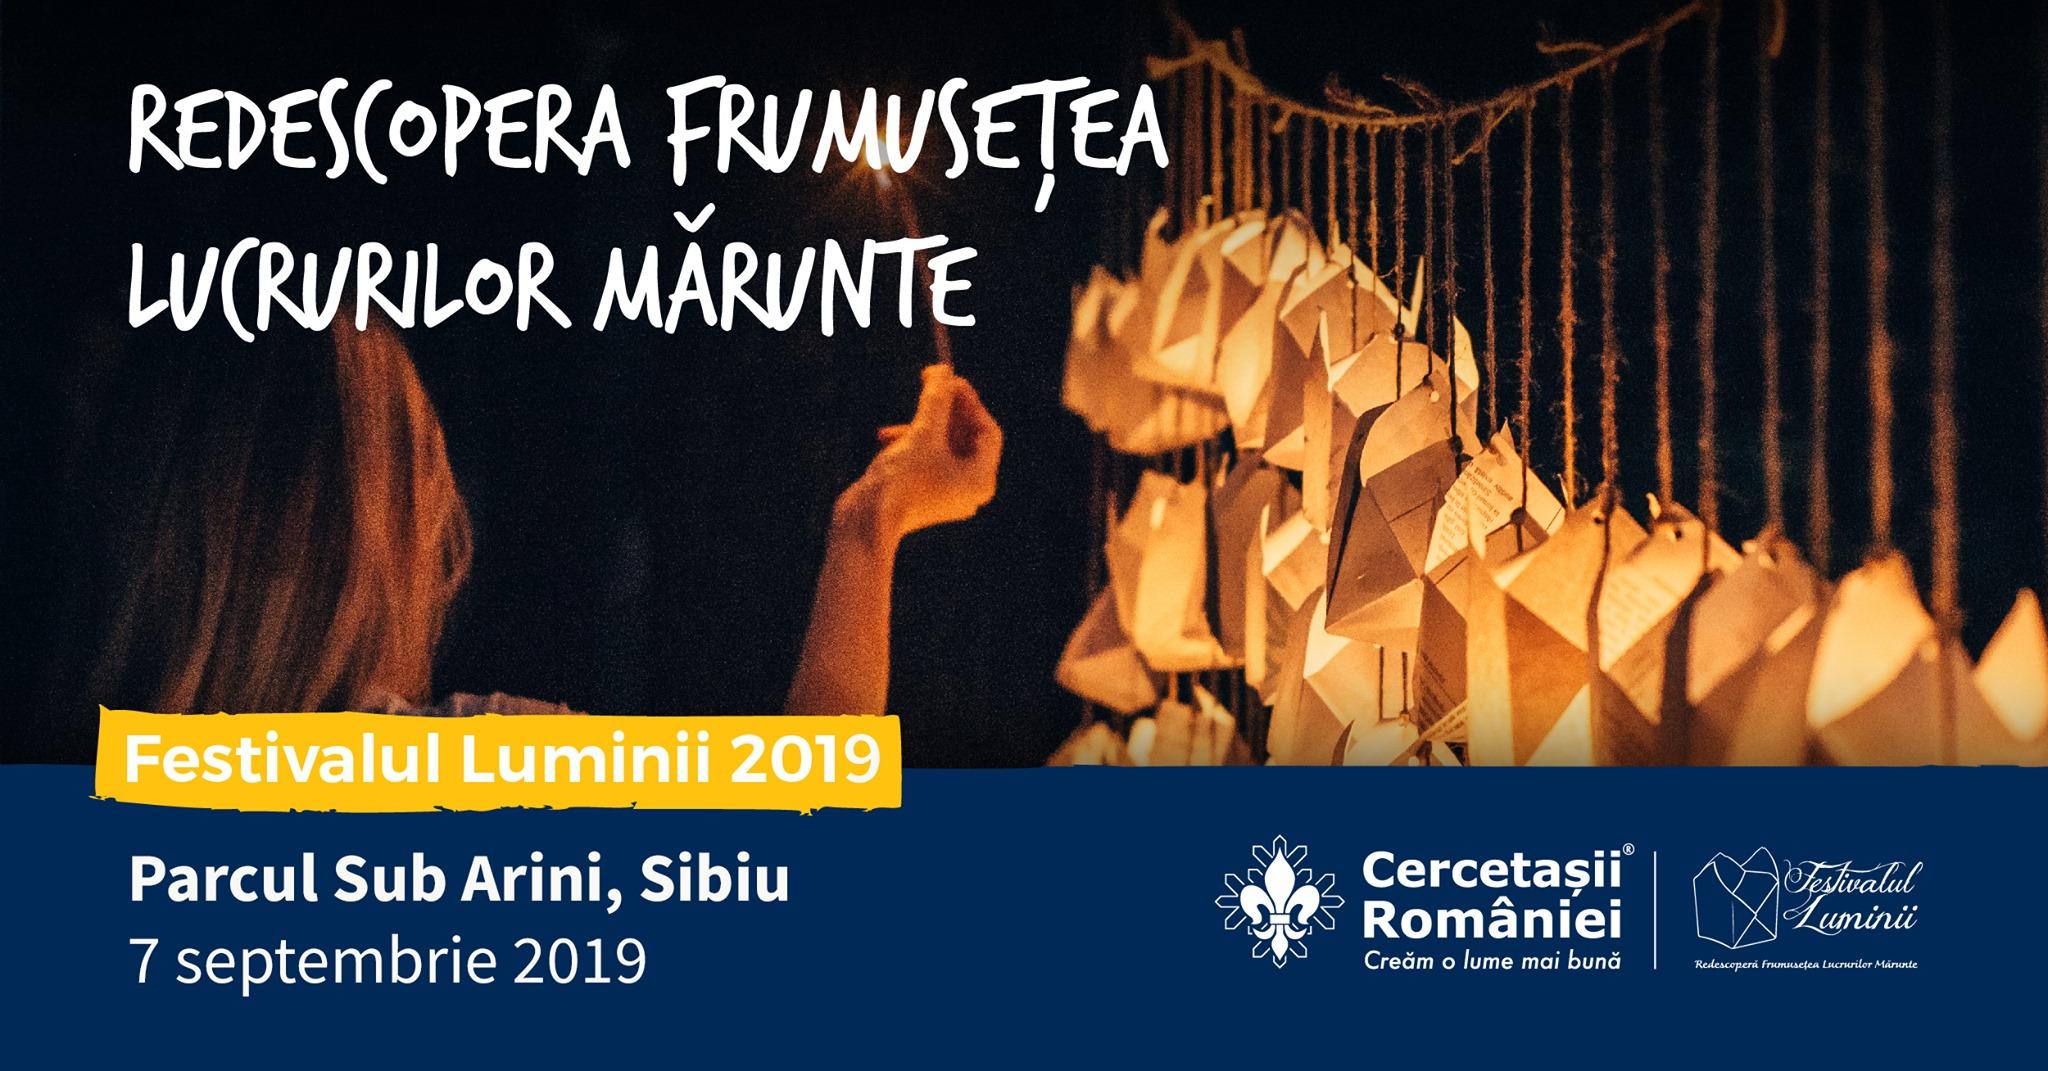 Festivalul Luminii 2019